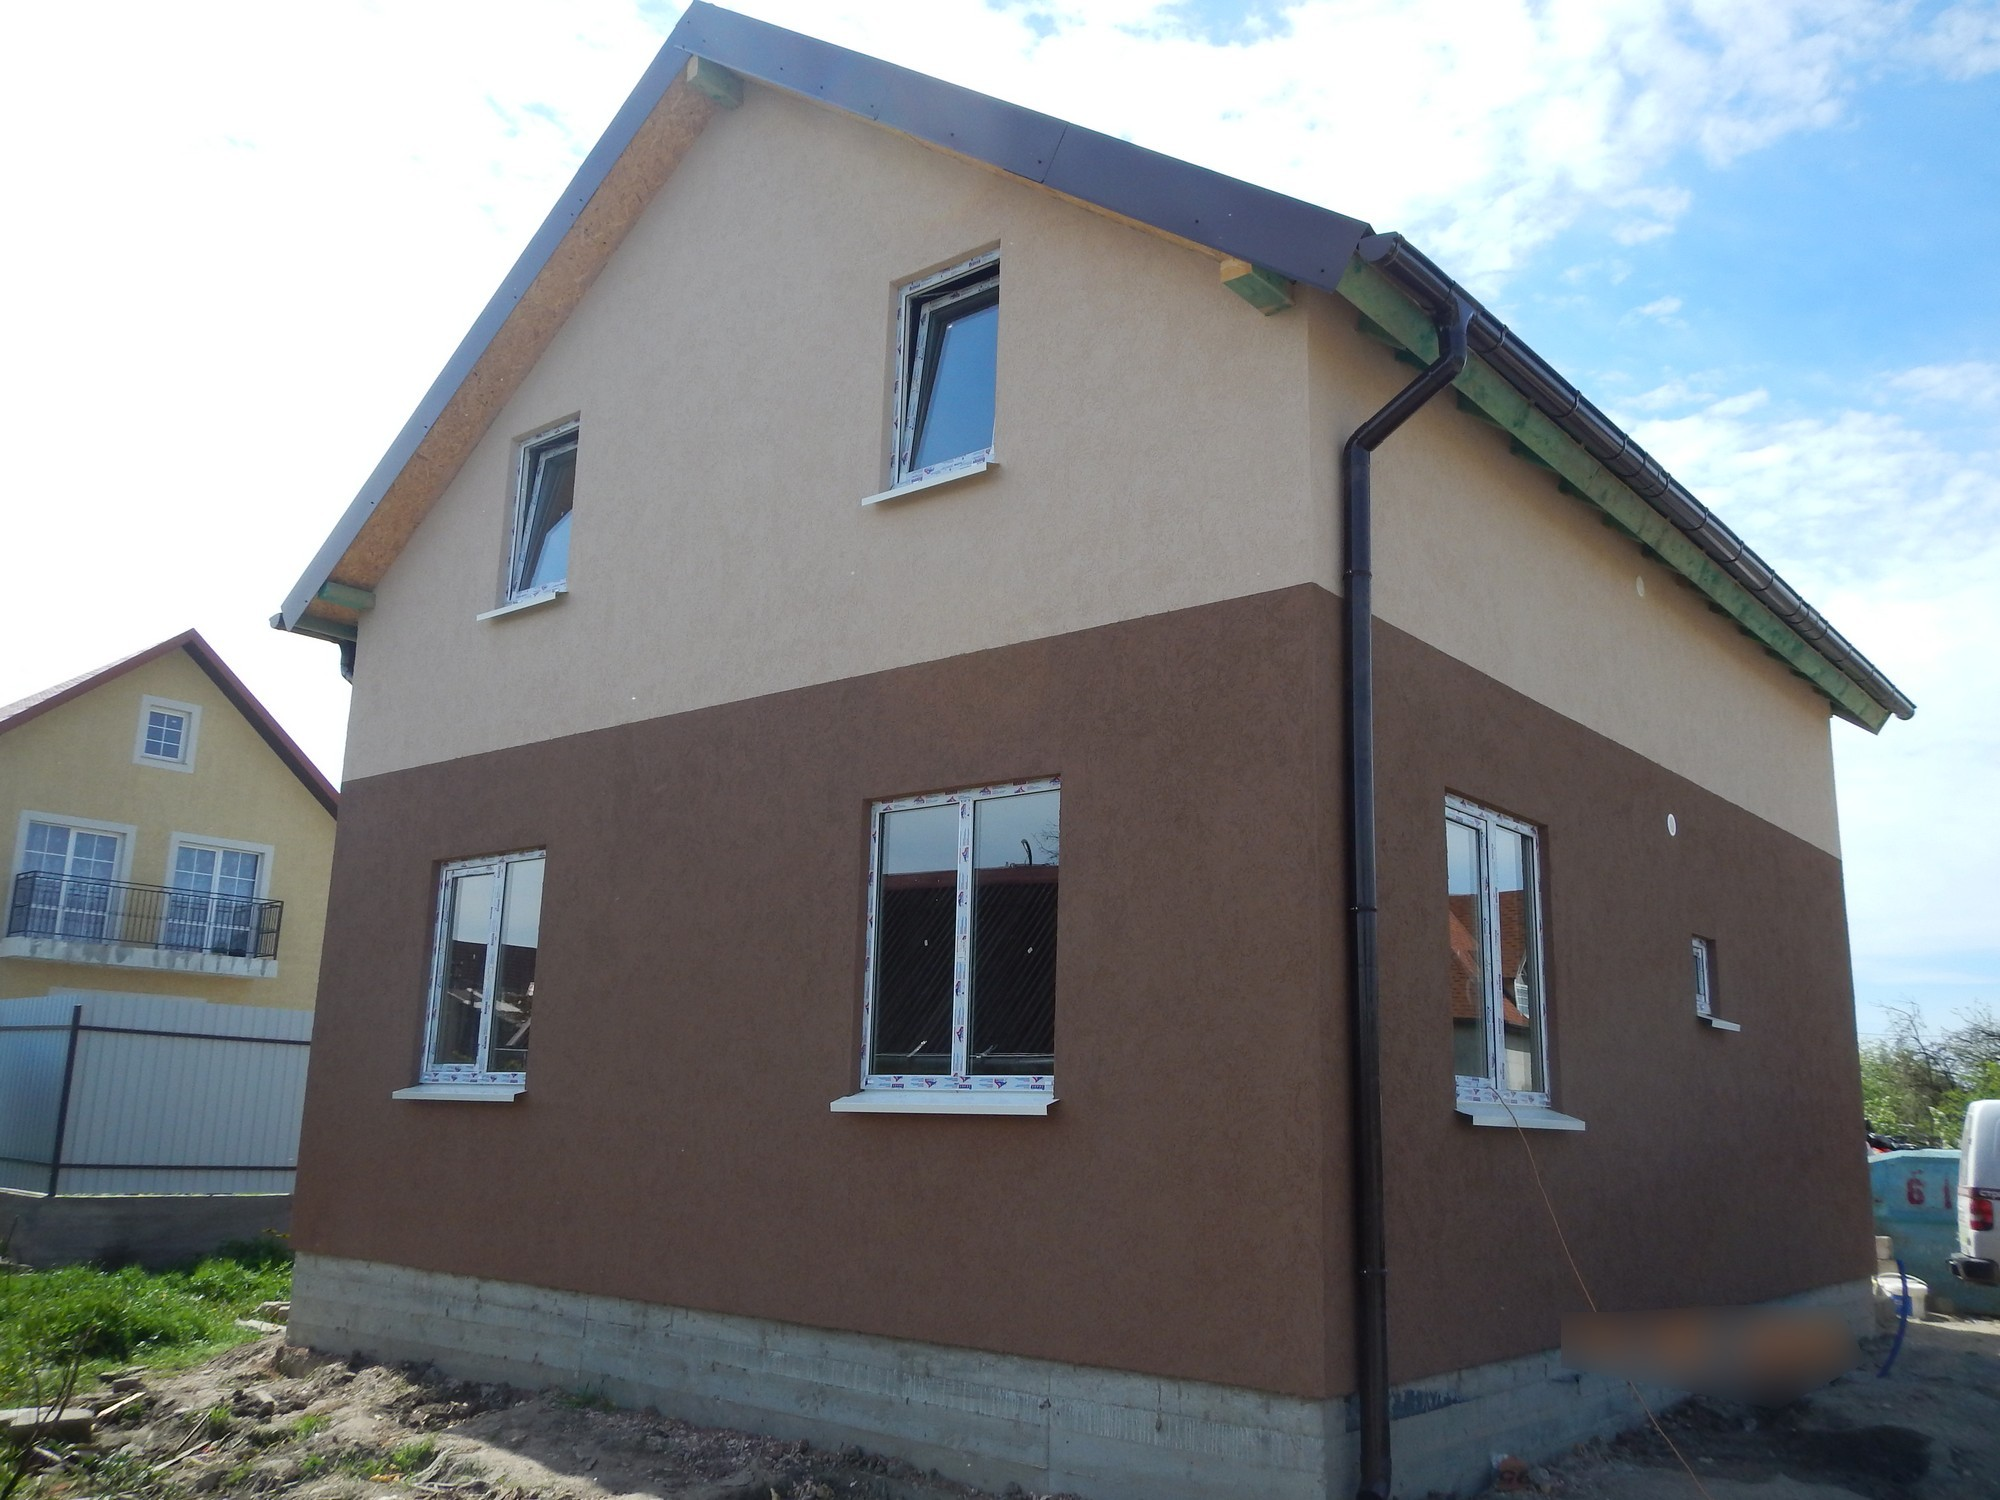 proekt-sip-doma-kd-1504-116m2031